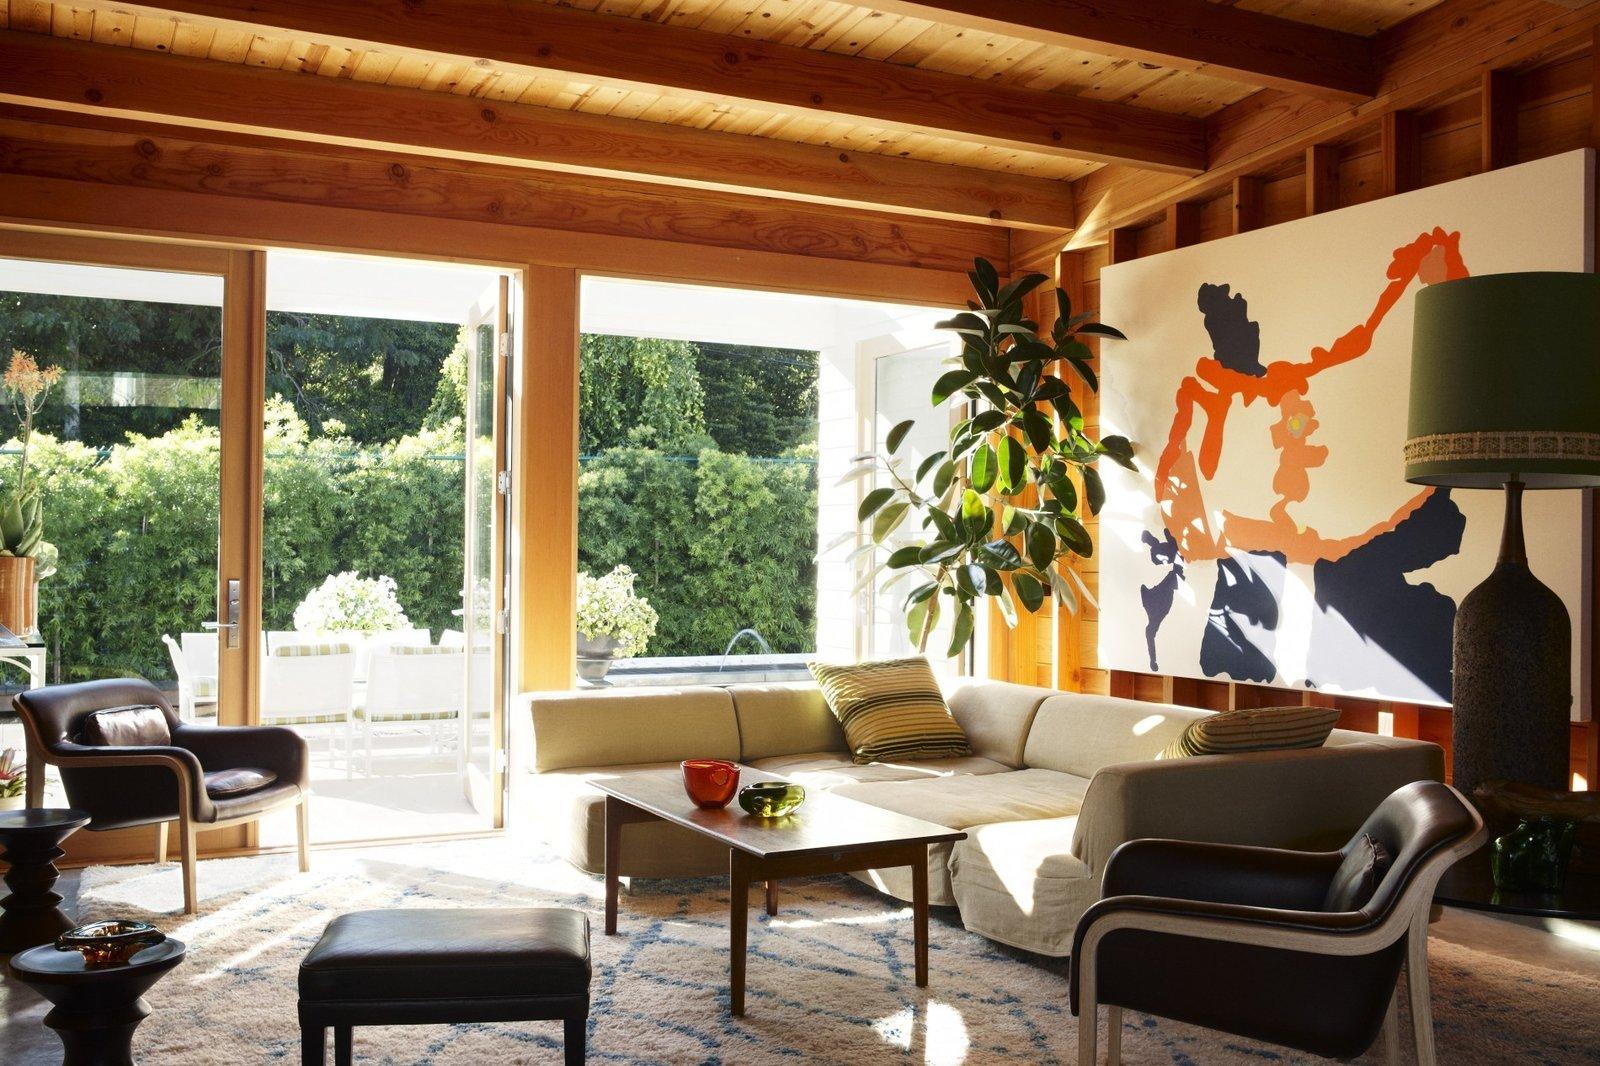 Surf Shack Modern Home In Santa Barbara California By Barbara Bestor On Dwell